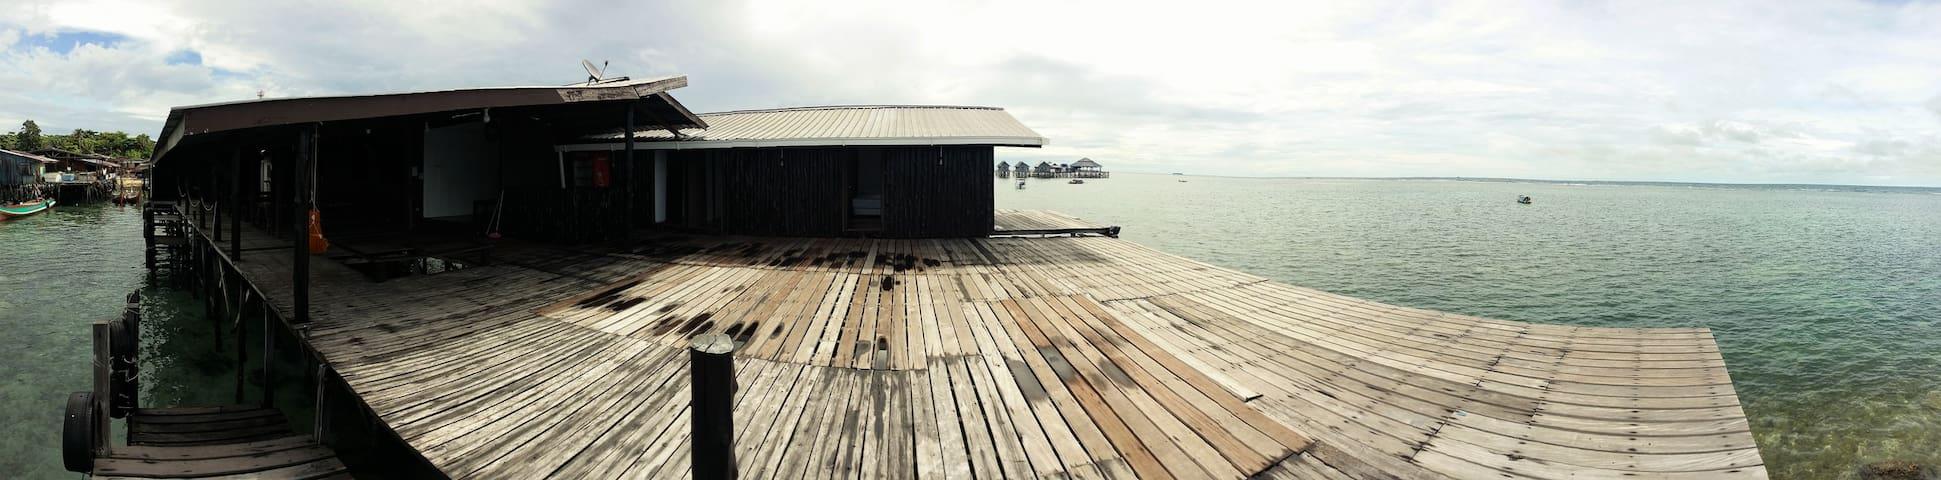 DY mabul lodge - Semporna - Alojamento ecológico